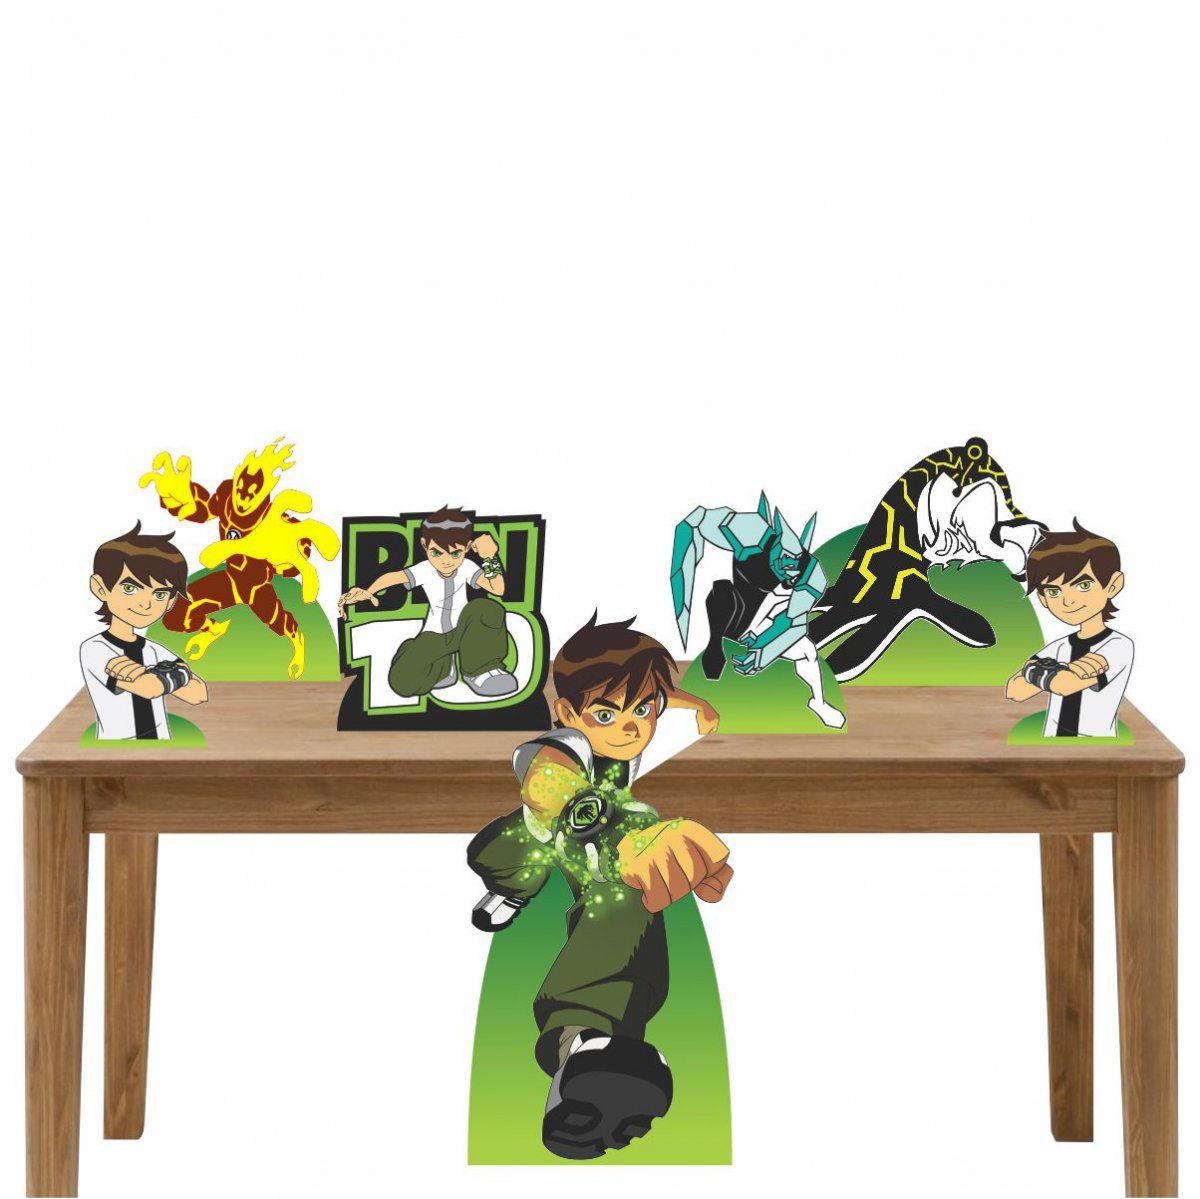 Kit Decoração de Festa Totem Display Ben 10 - 7 Peças